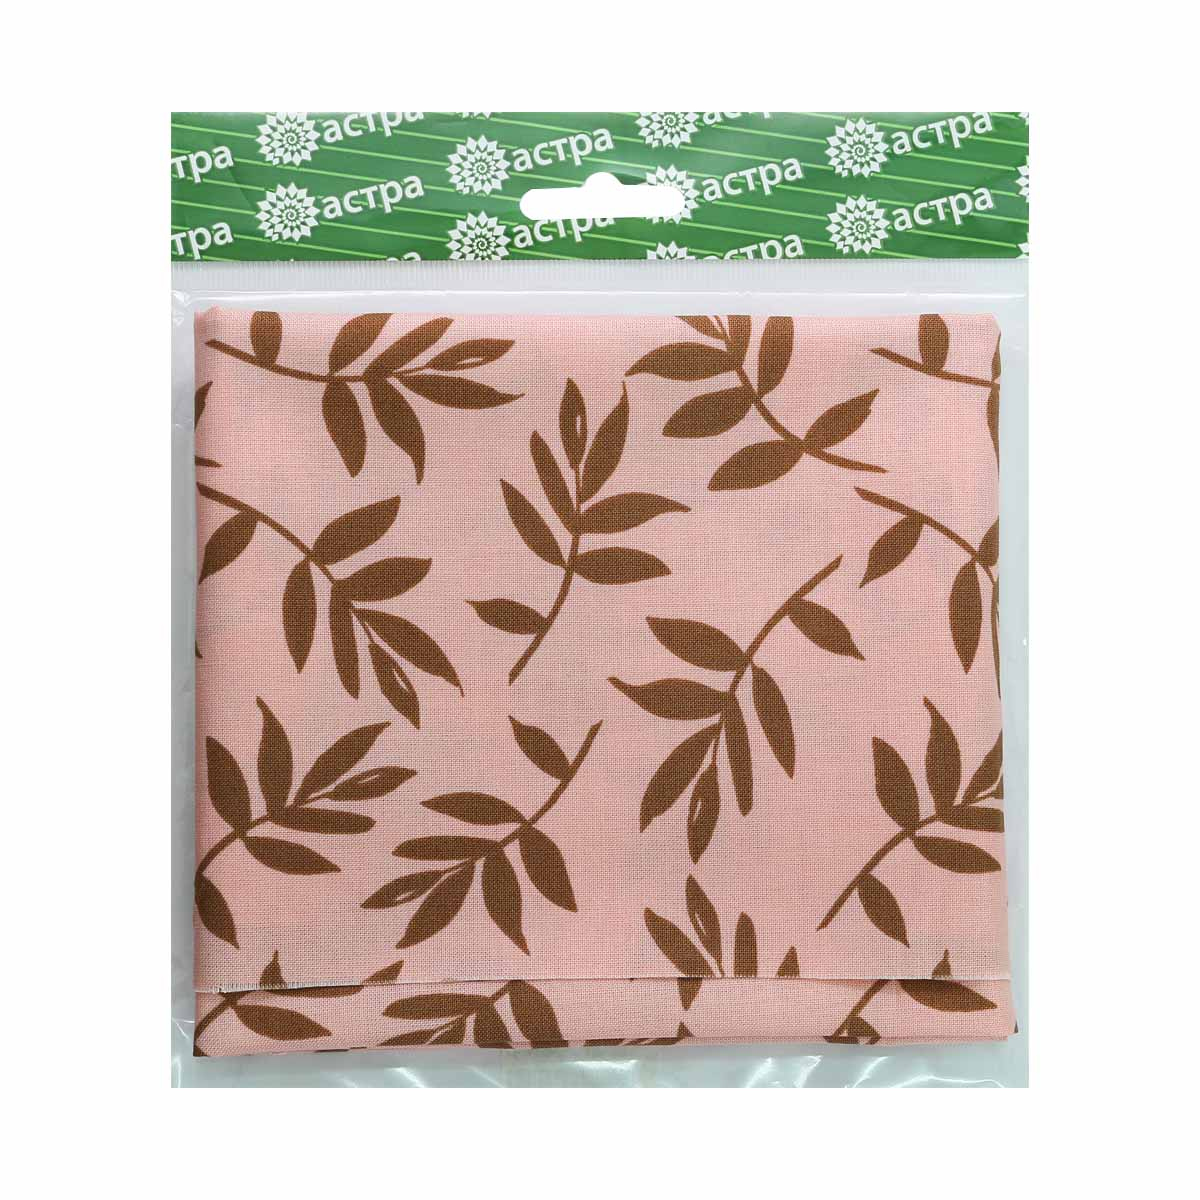 PWNW015-Peach FREE SPIRIT Ткань 100% хл,50*55см Астра